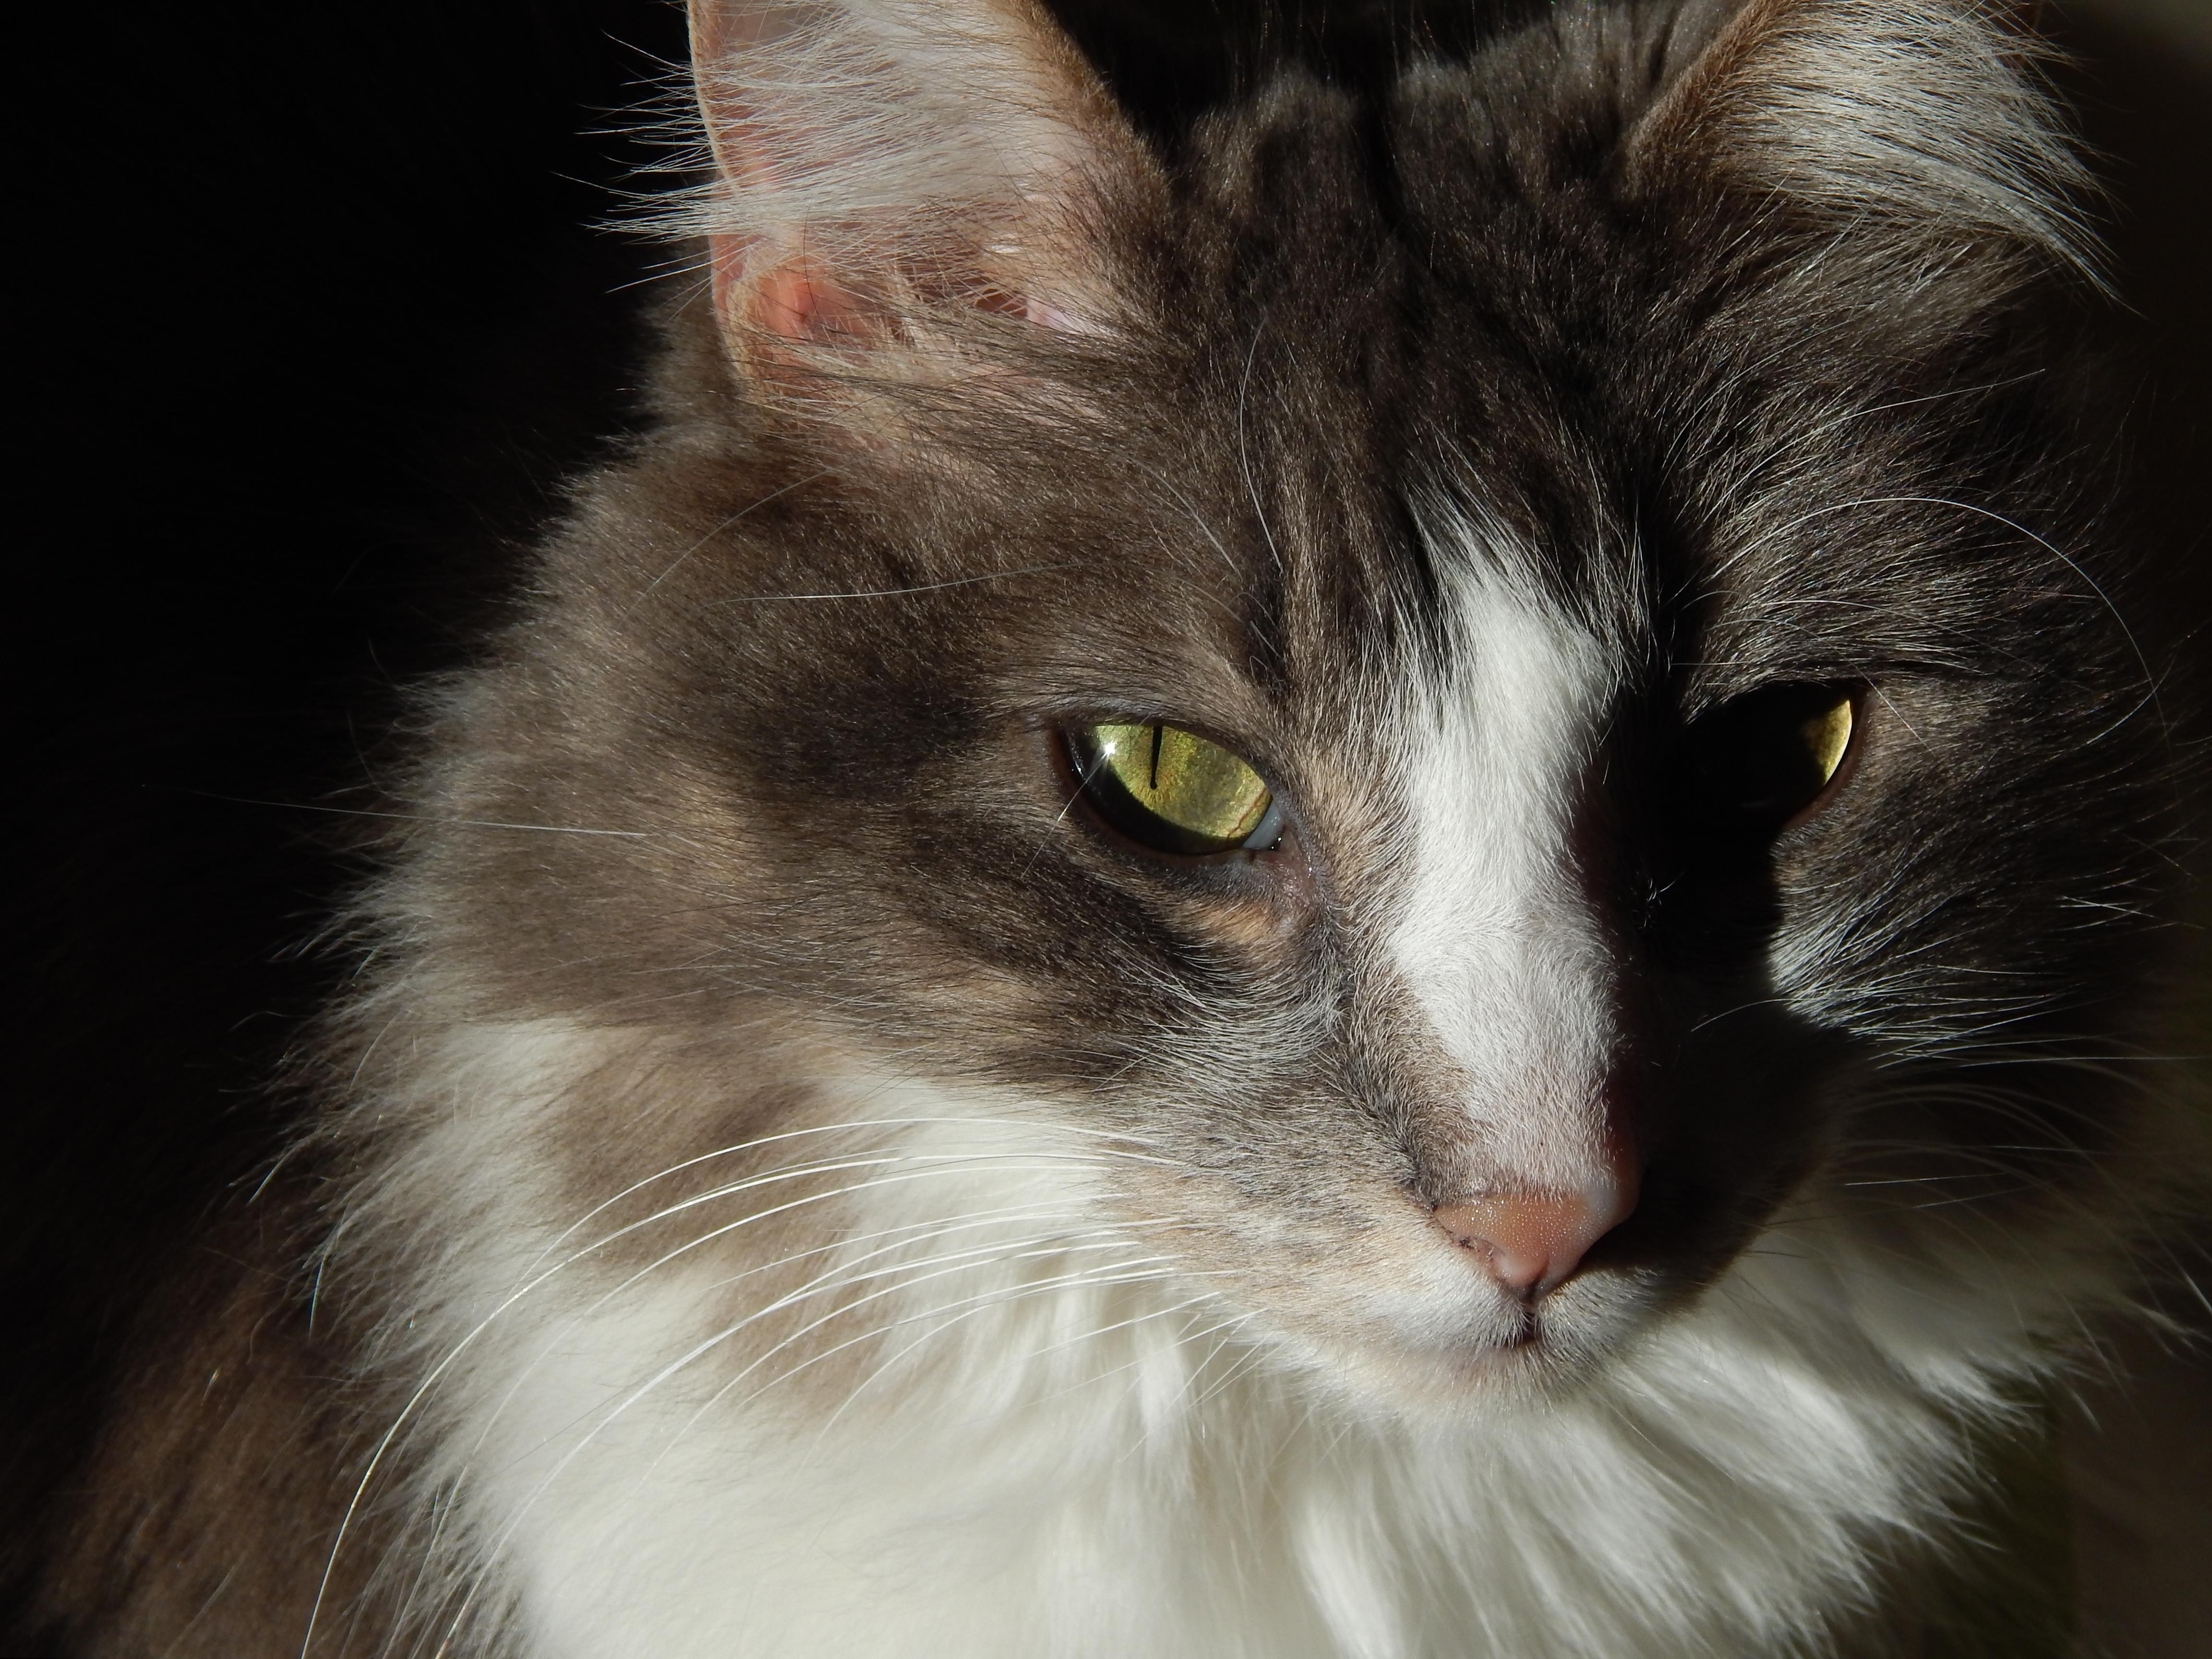 Cat, Closeup, Feline, Fur, Head, HQ Photo